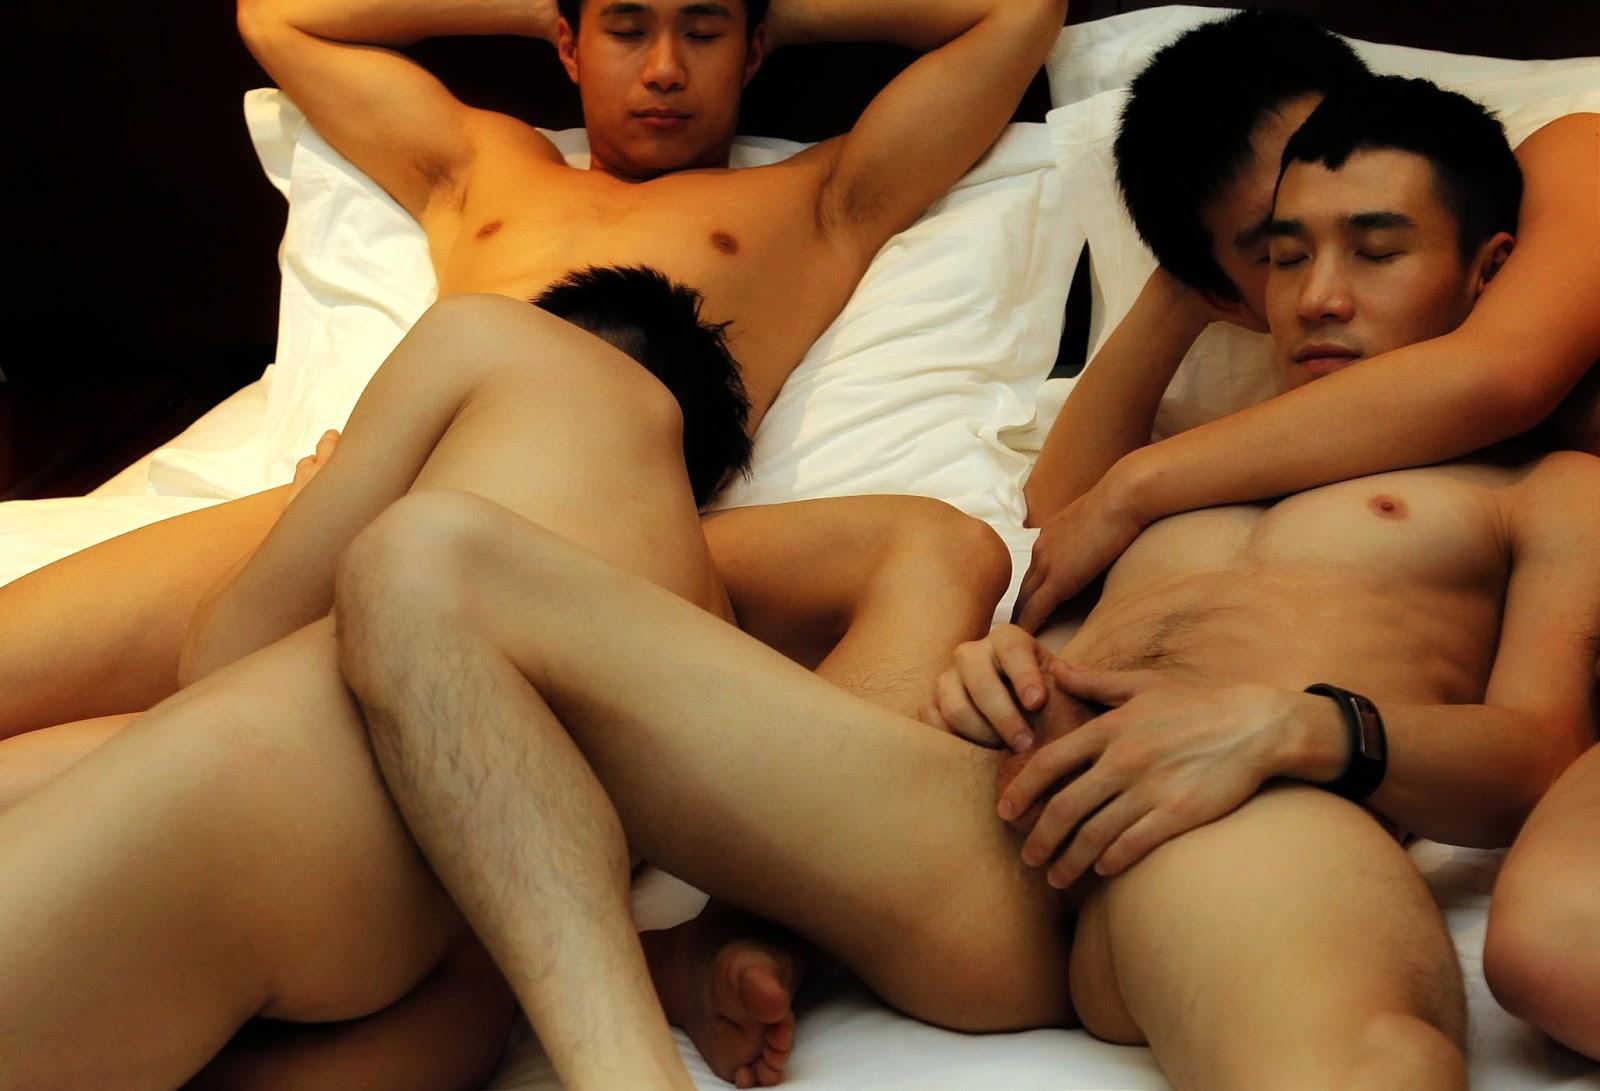 Suk Suk Tells Secret Love Story Of Hong Kong's Closeted Uncles Quartz